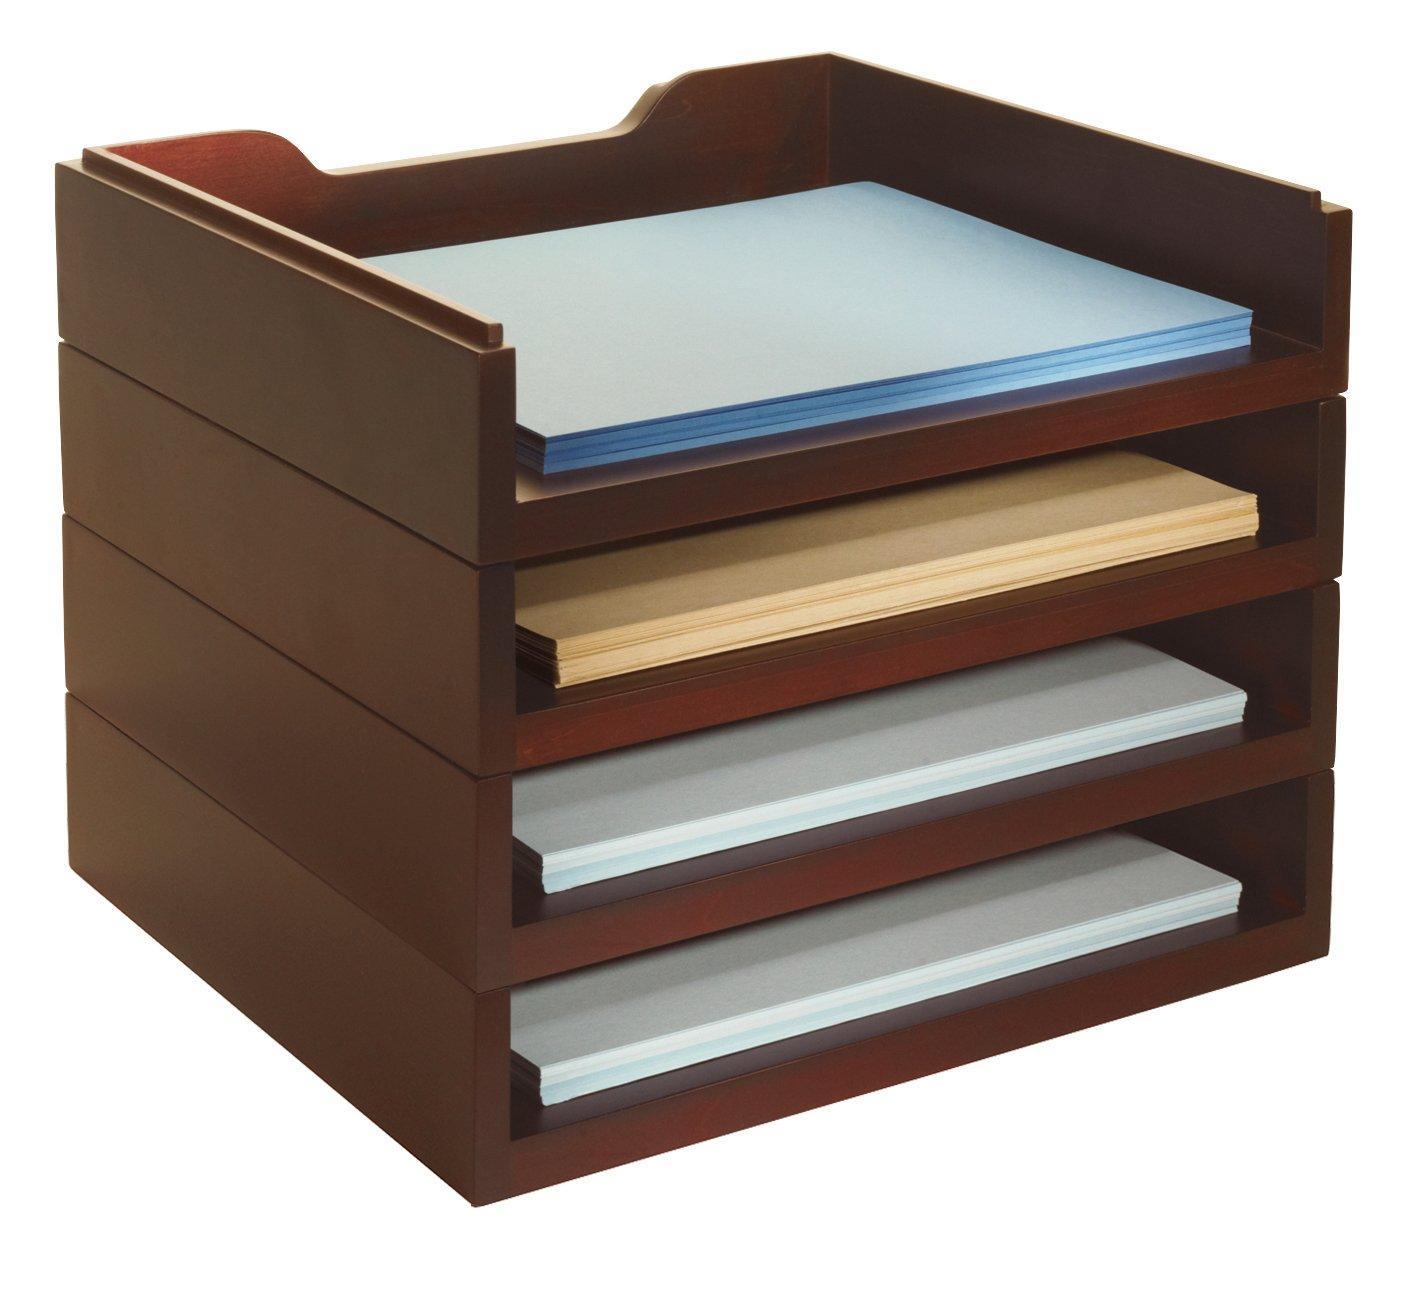 Bindertek Stacking Wood Desk Organizers with 4 Letter Tray Kit, Mahogany (WK6-MA) by Bindertek